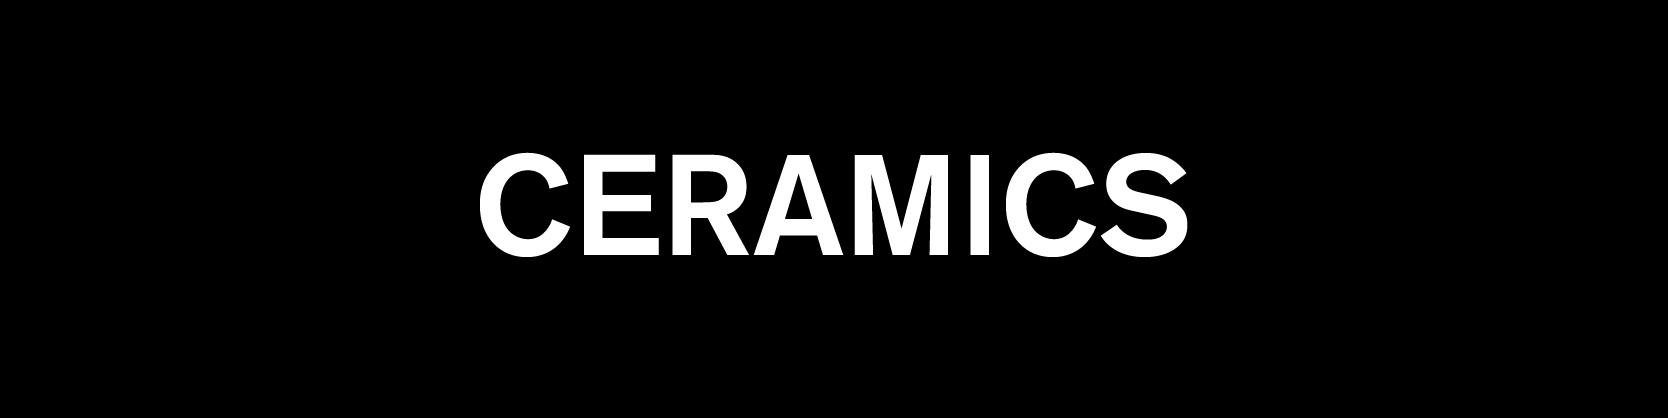 CERAMICS_The Location.png